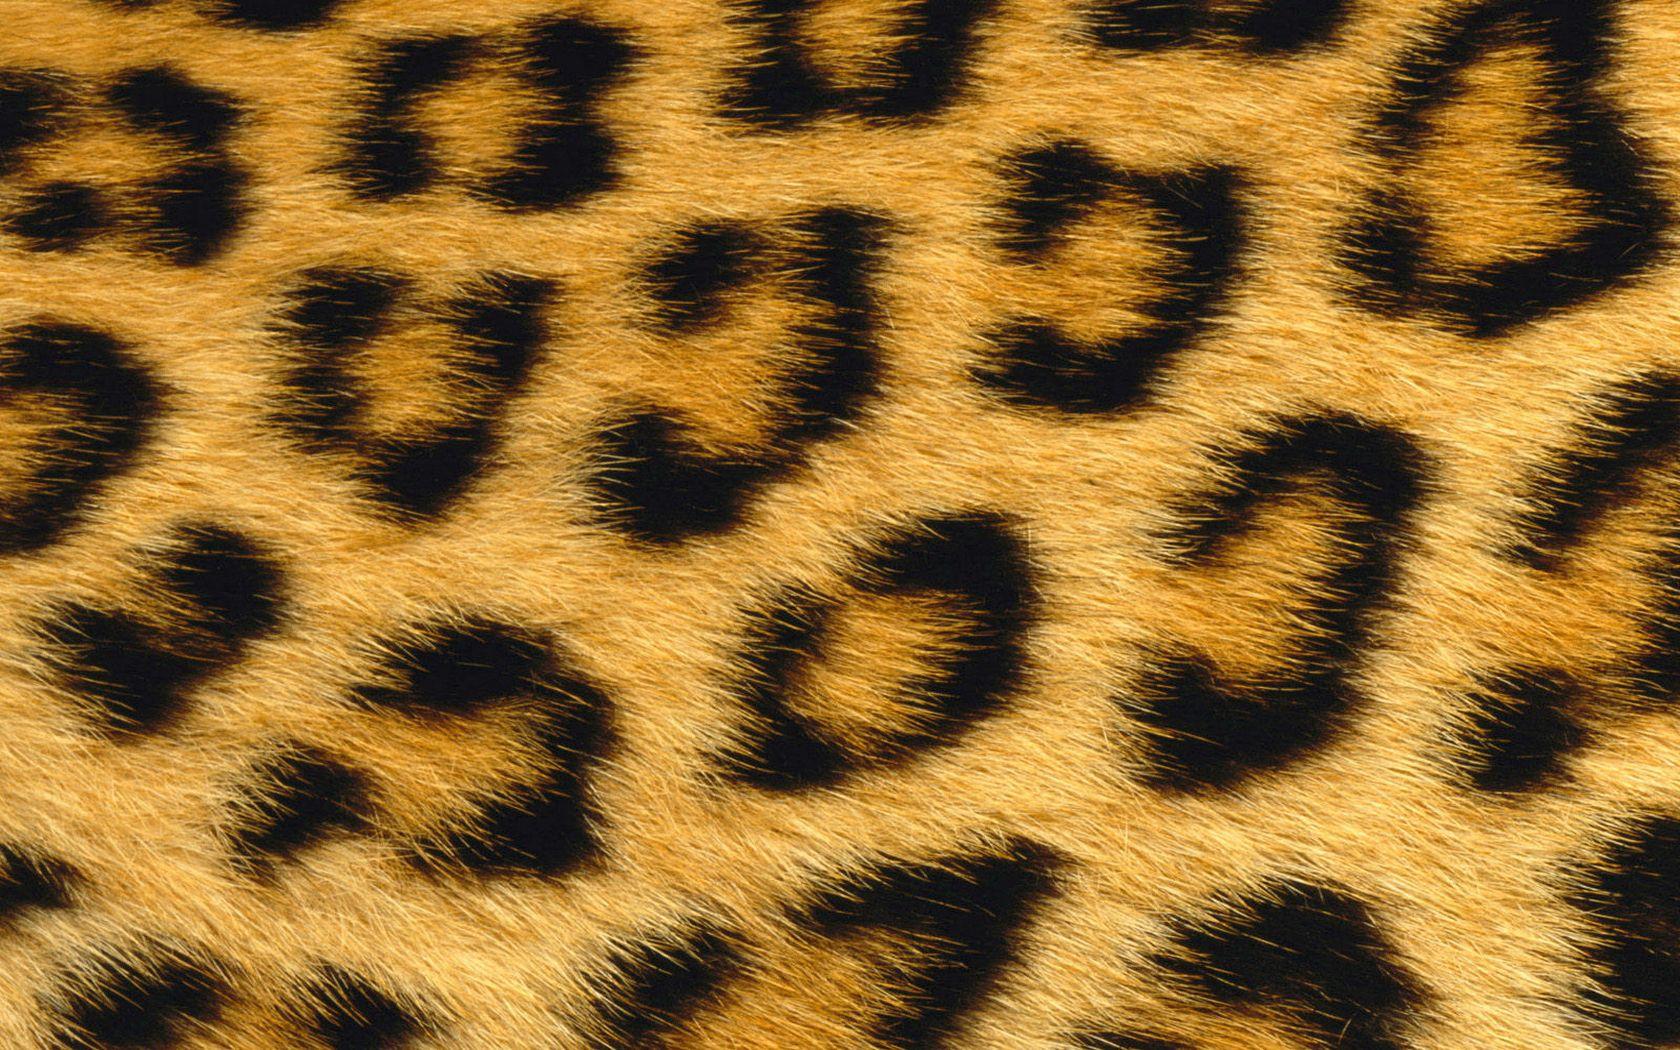 Pin By Elizabeth Welsh On Wallpaper Cheetah Print Wallpaper Animal Print Wallpaper Print Wallpaper